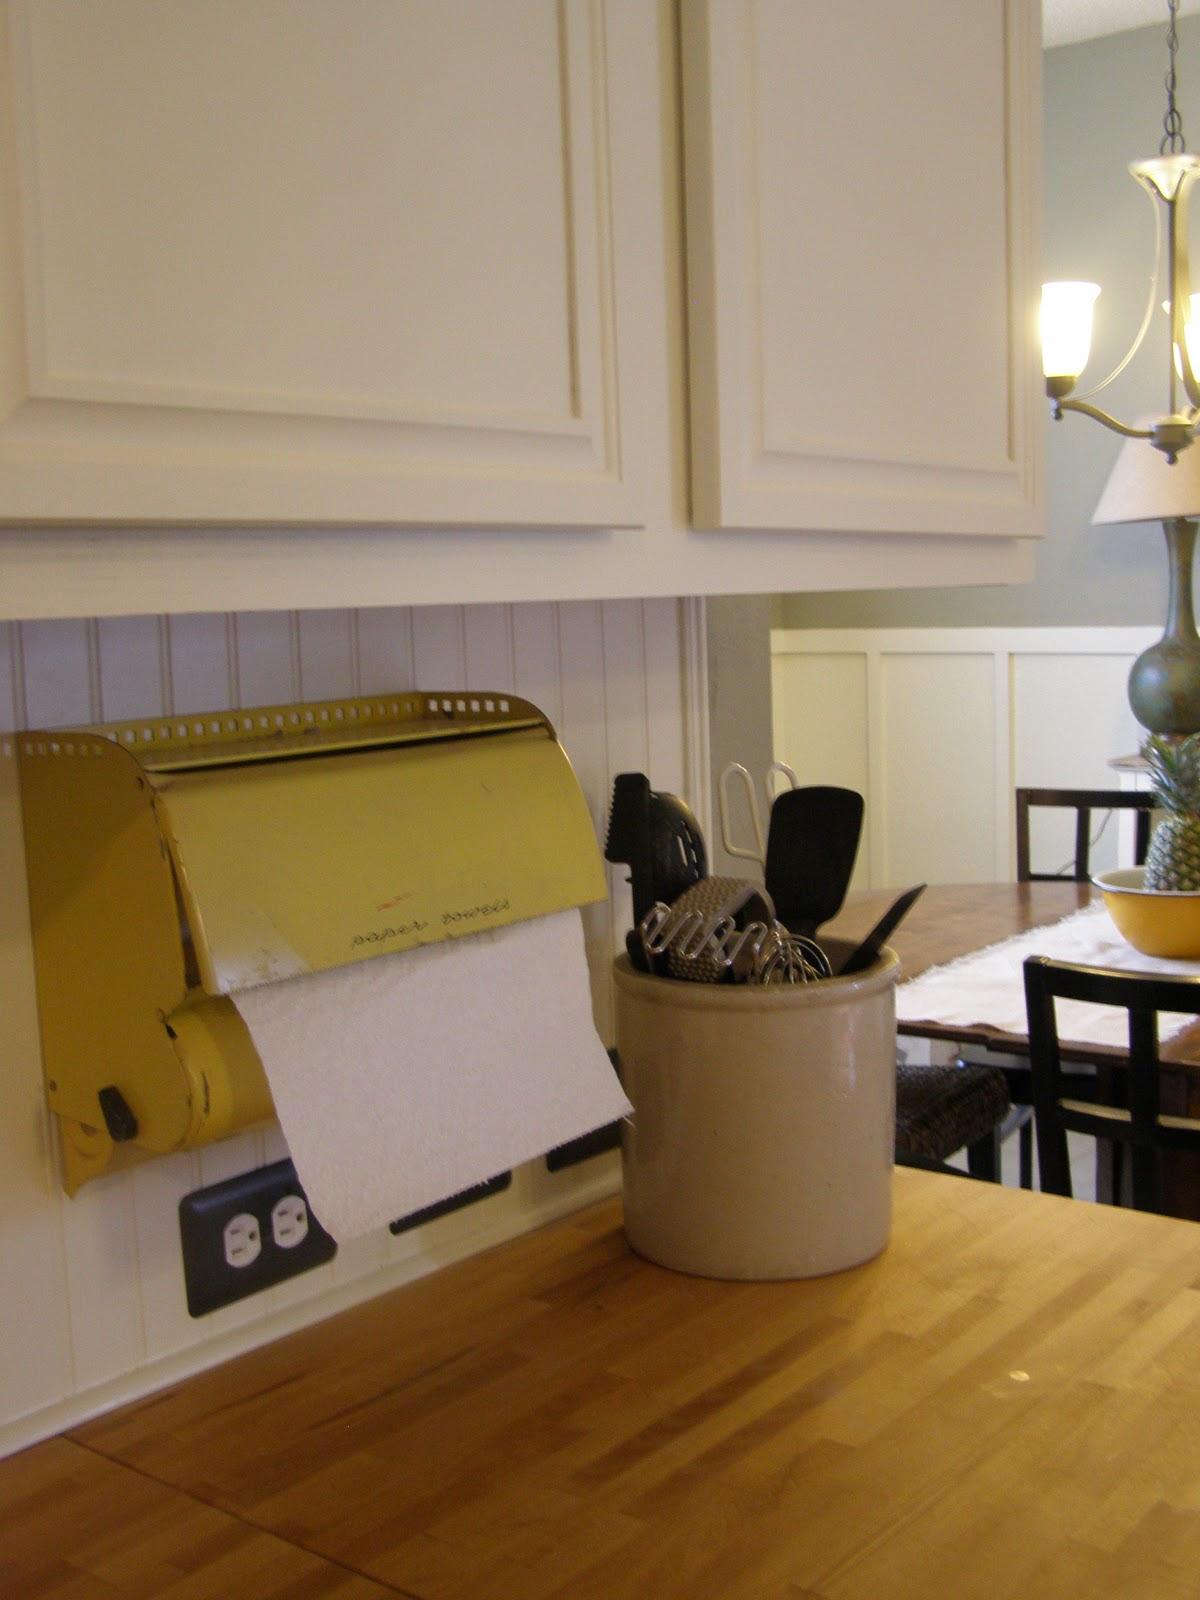 automatic paper towel dispenser for kitchen outdoor plans pdf